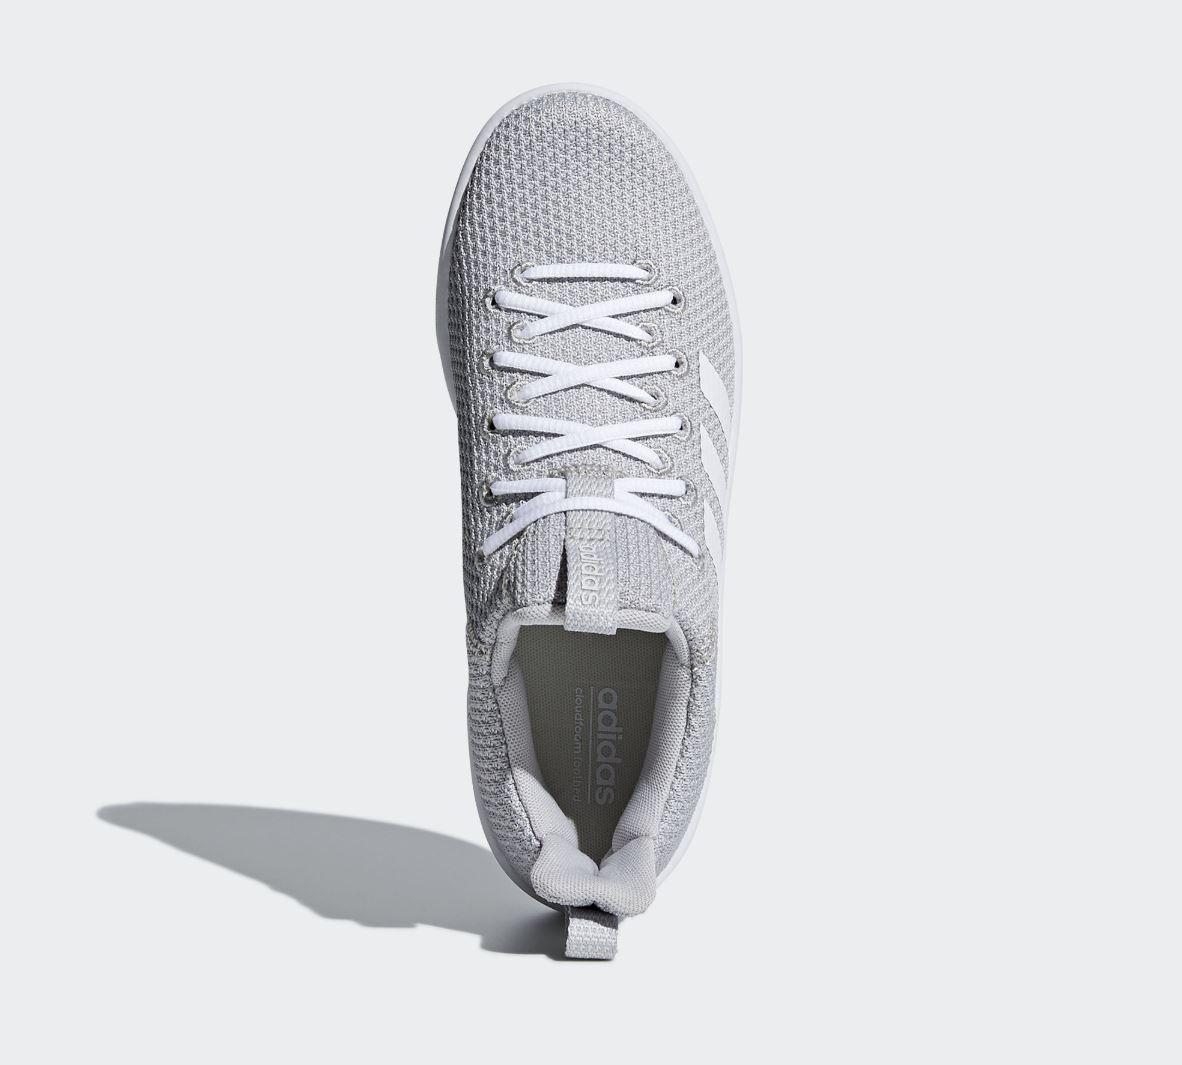 500c7260a56 adidas Cloudfoam Advantage Adapt Women s Shoes -  27.99 + Free Shipping